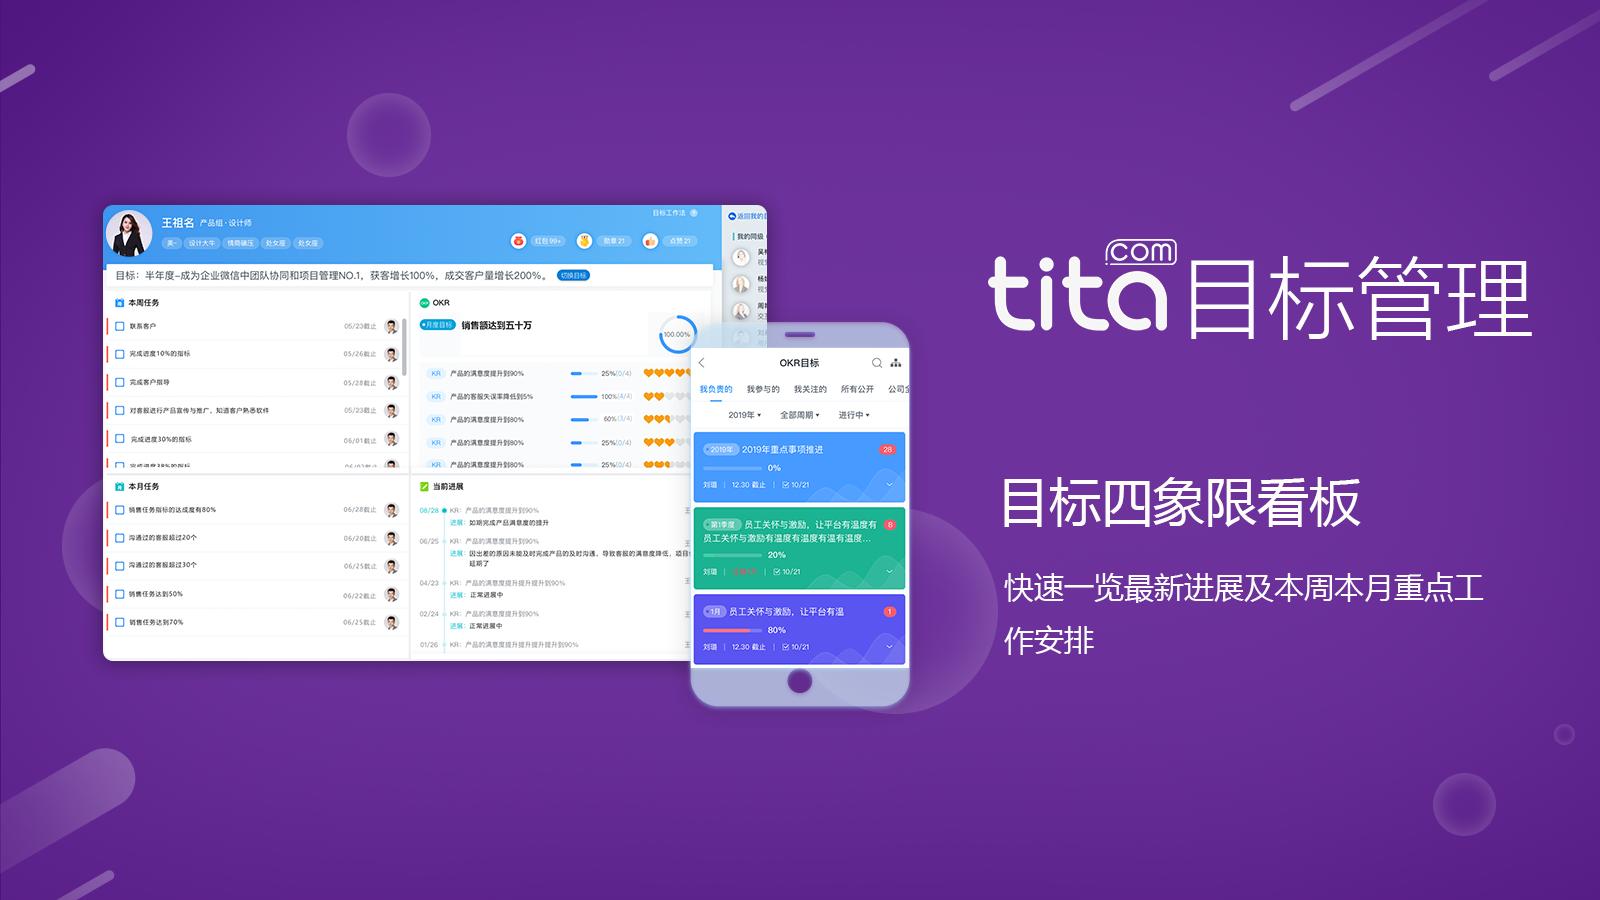 Tita | 人员规模突破百人,数据化管理思维如何帮助企业成功飞跃